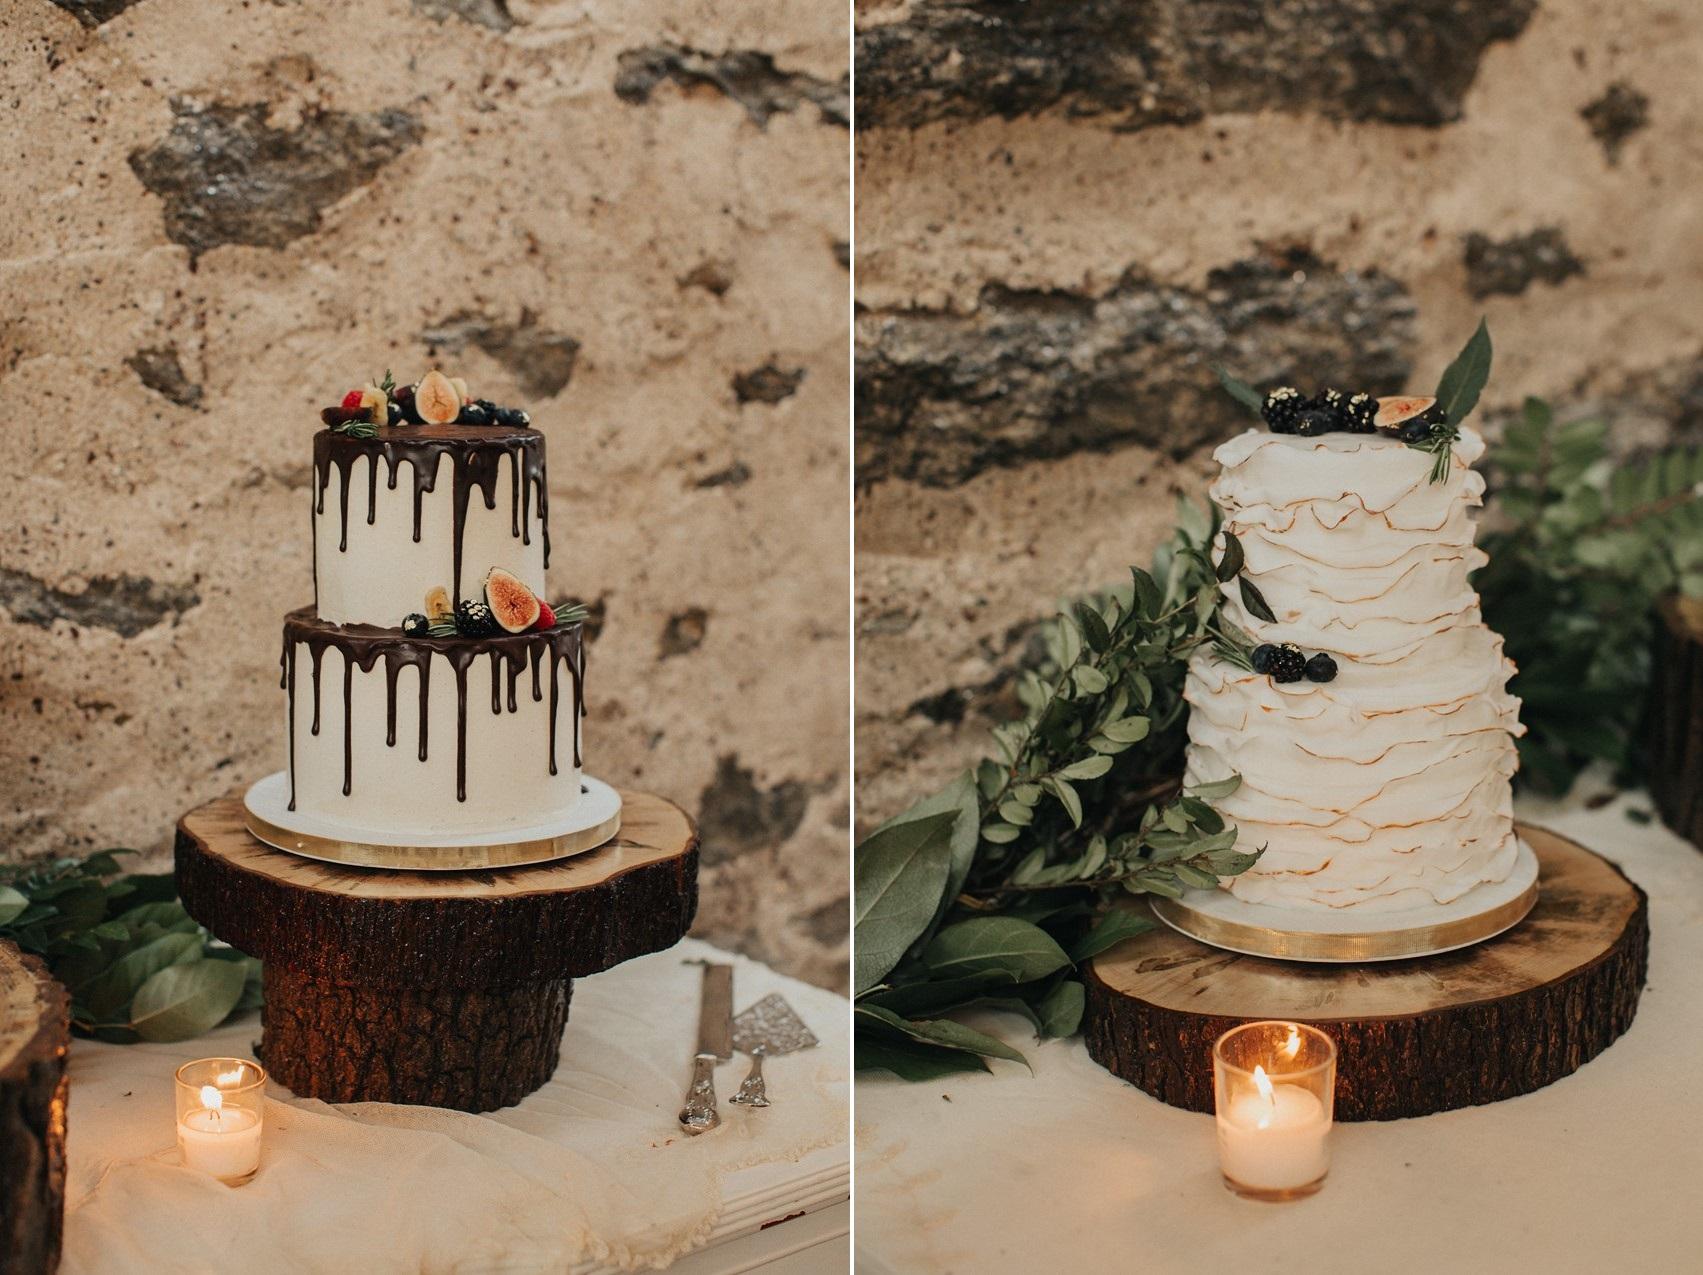 Drizzle Wedding Cake